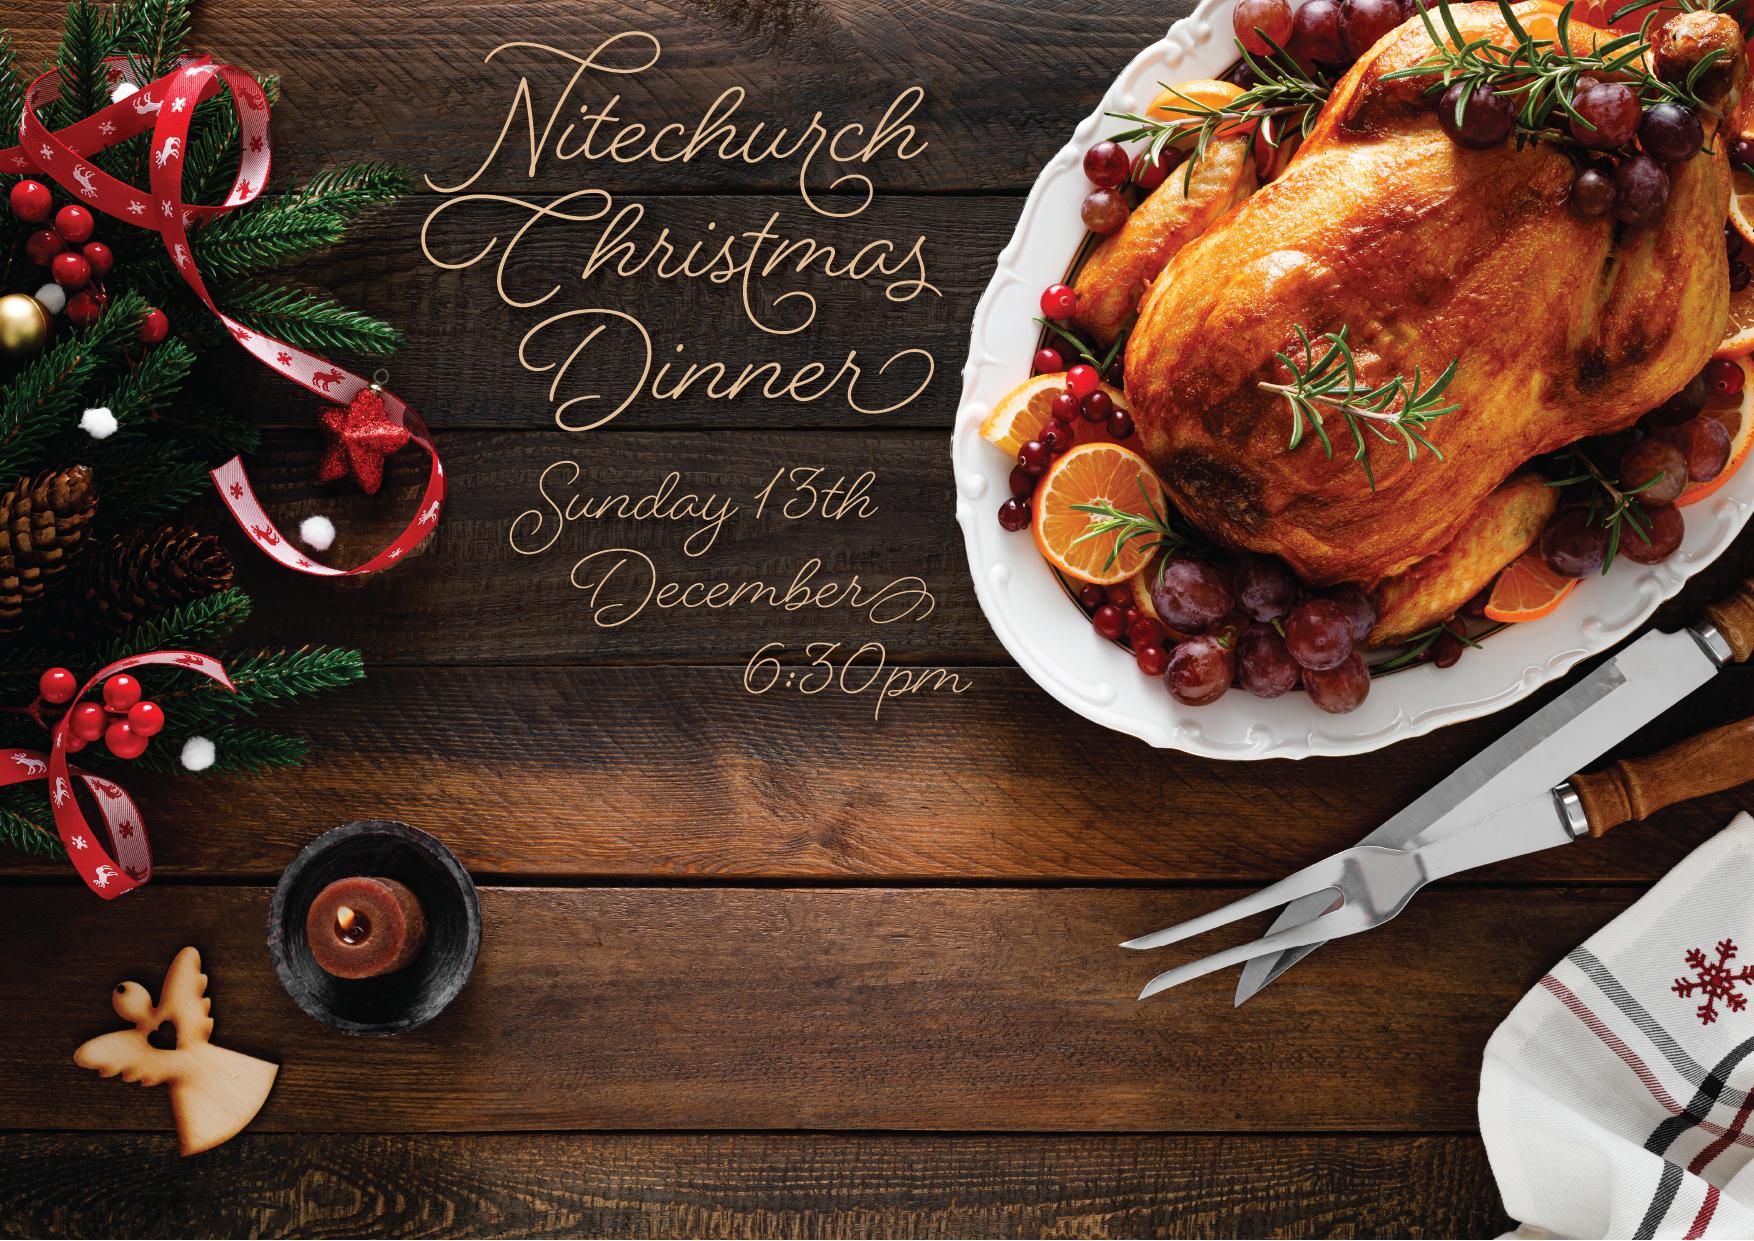 Nitechurch Christmas Dinner